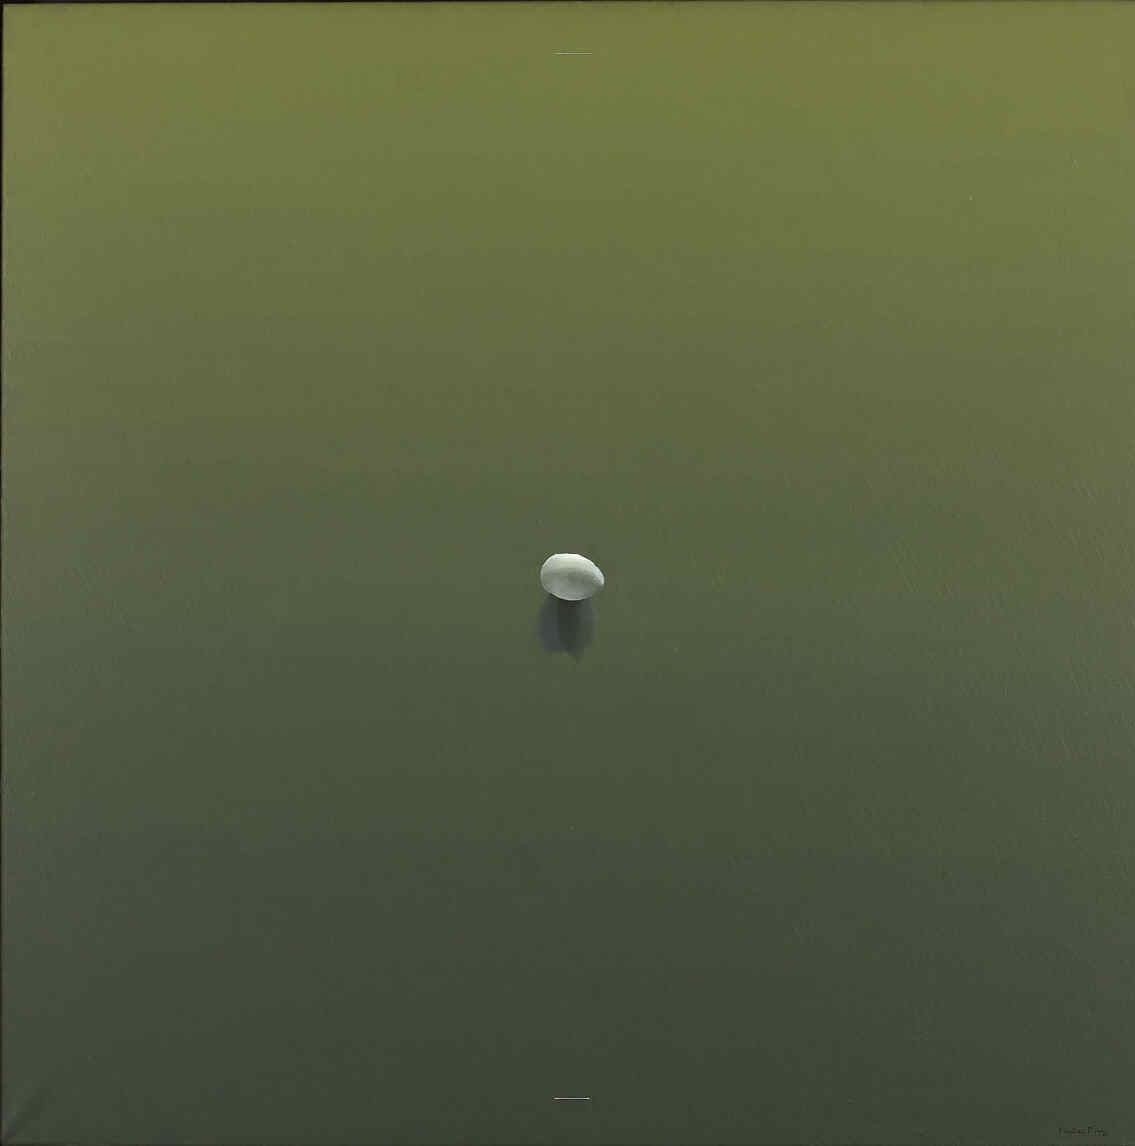 Espai verd amb un ou (3) [Espacio verde con un huevo (3)]